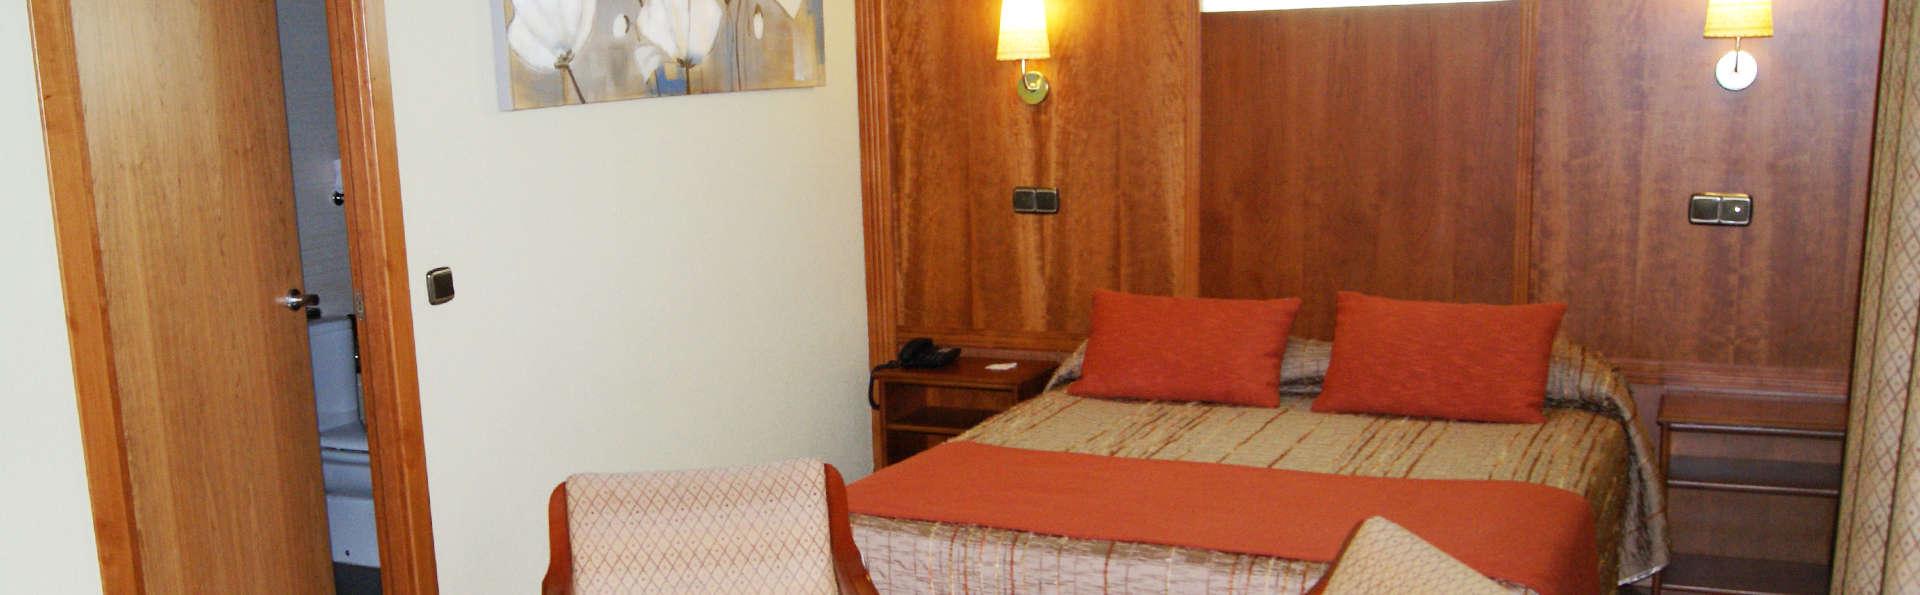 Hotel Mozárbez Salamanca - EDIT_room.jpg